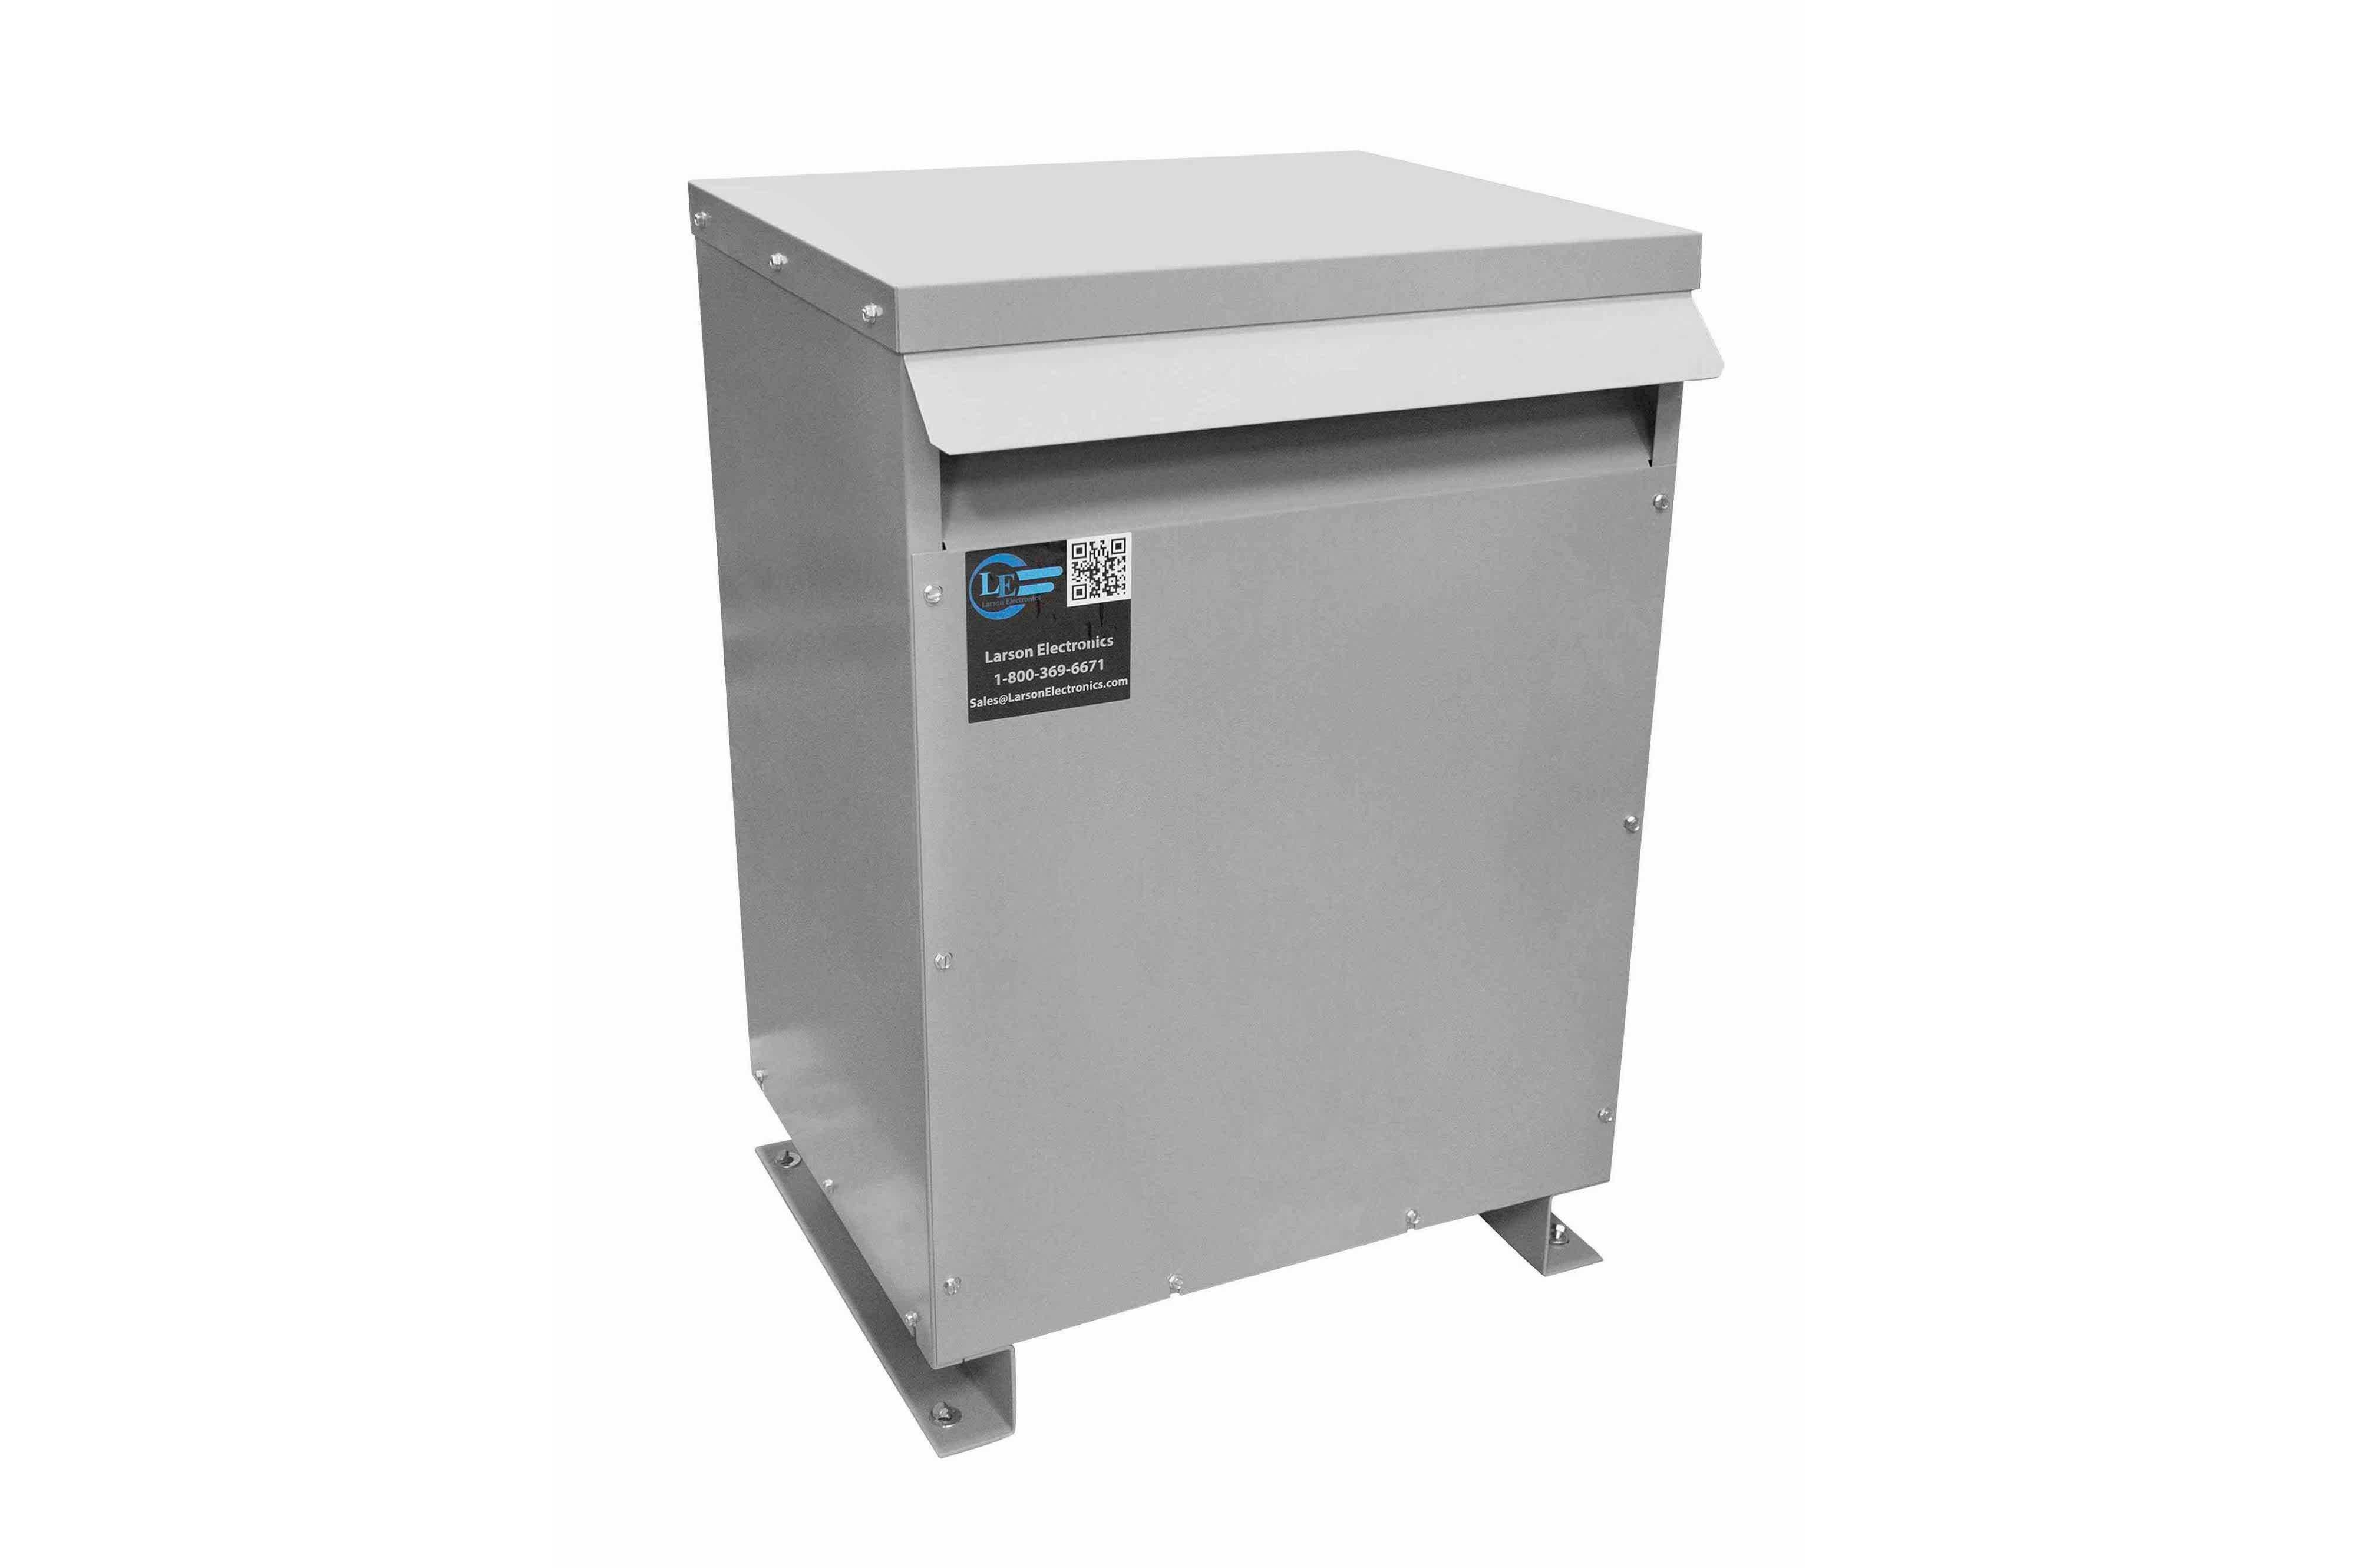 45 kVA 3PH Isolation Transformer, 575V Wye Primary, 380Y/220 Wye-N Secondary, N3R, Ventilated, 60 Hz